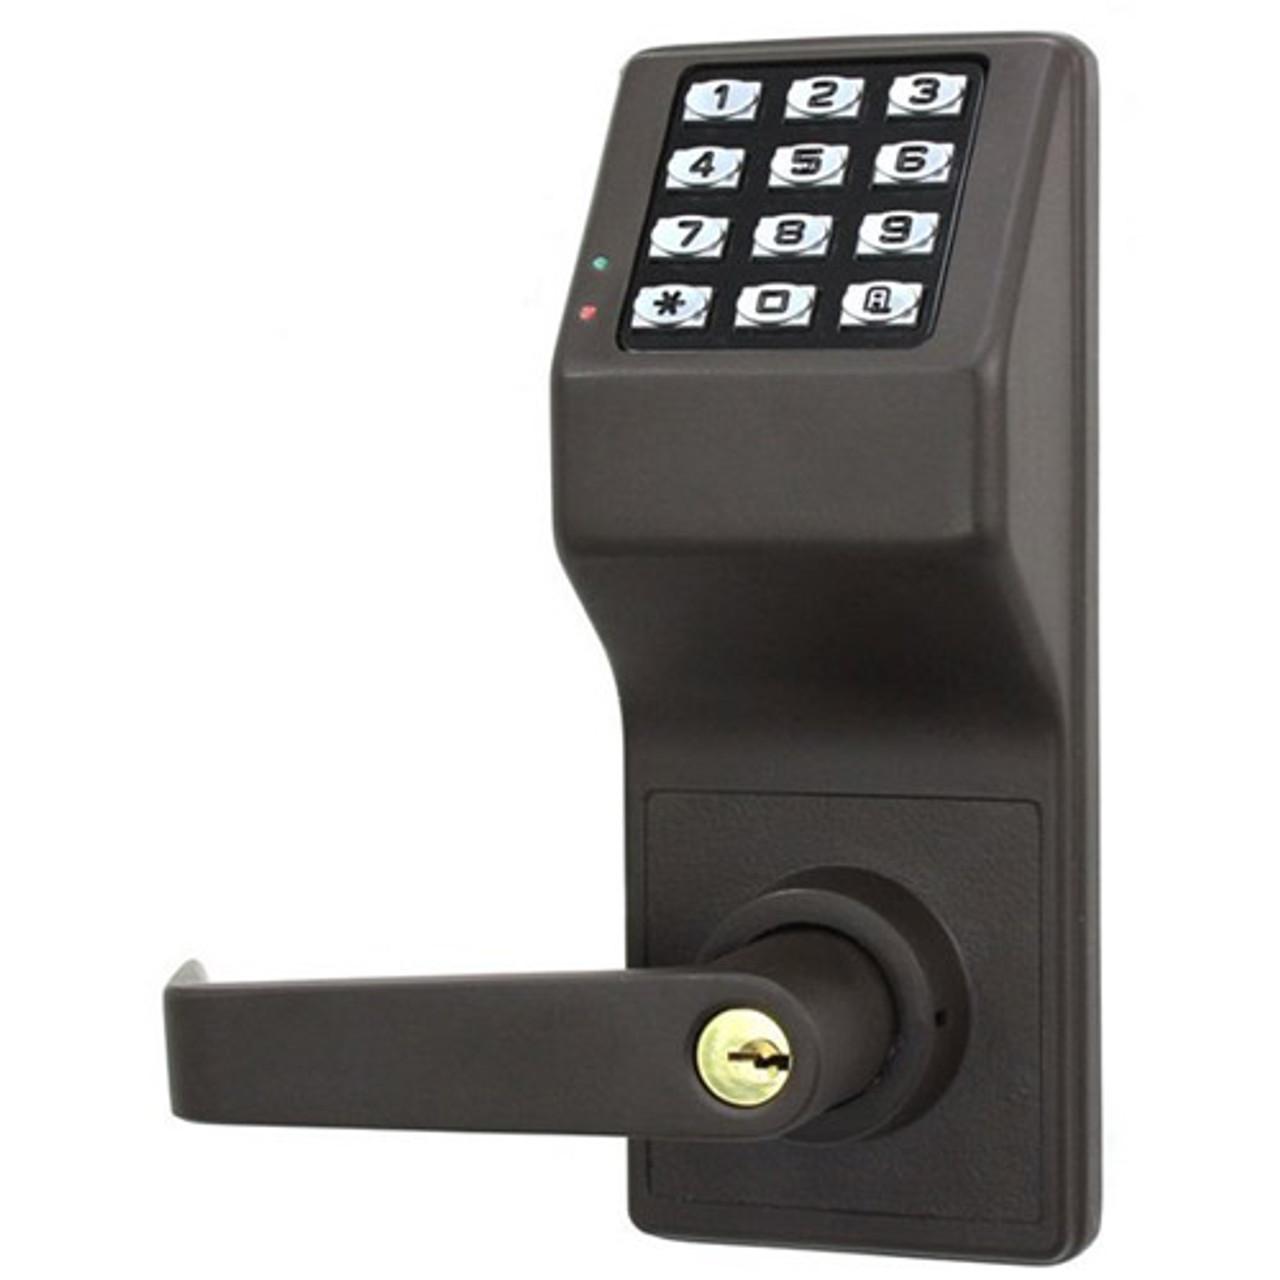 DL3000WPIC-C-US10B Alarm Lock Trilogy Electronic Digital Lock in Duronodic Finish